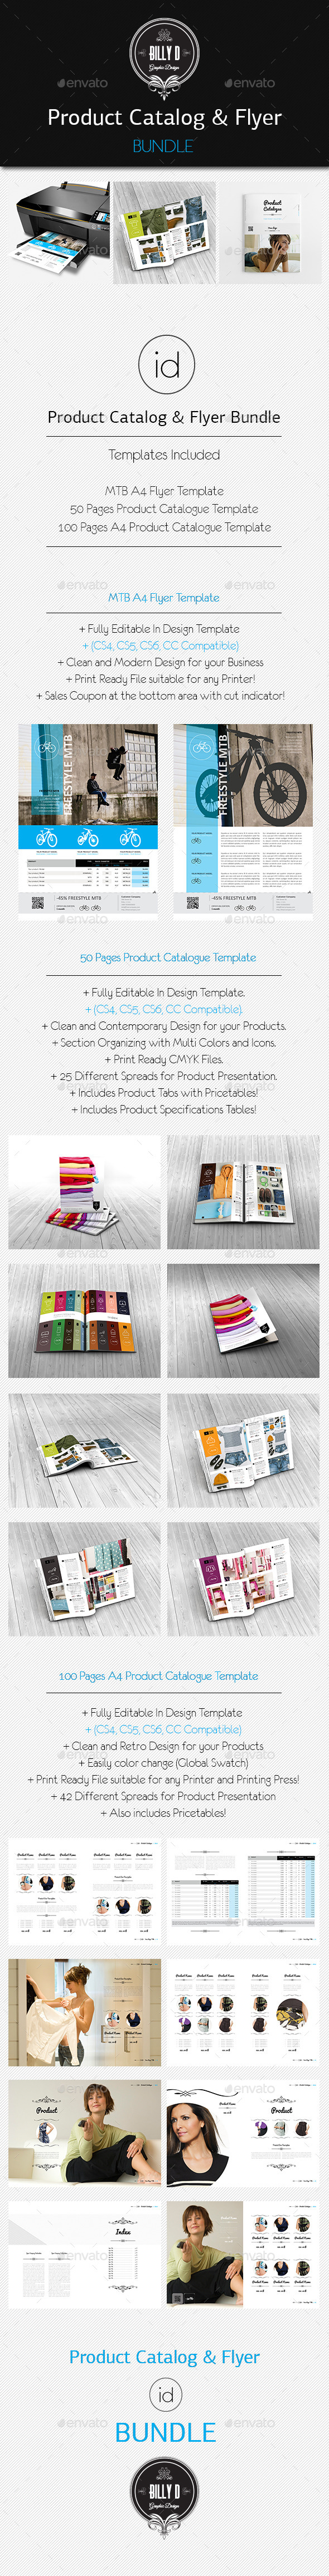 GraphicRiver Product Catalog & Flyer Bundle 9206955